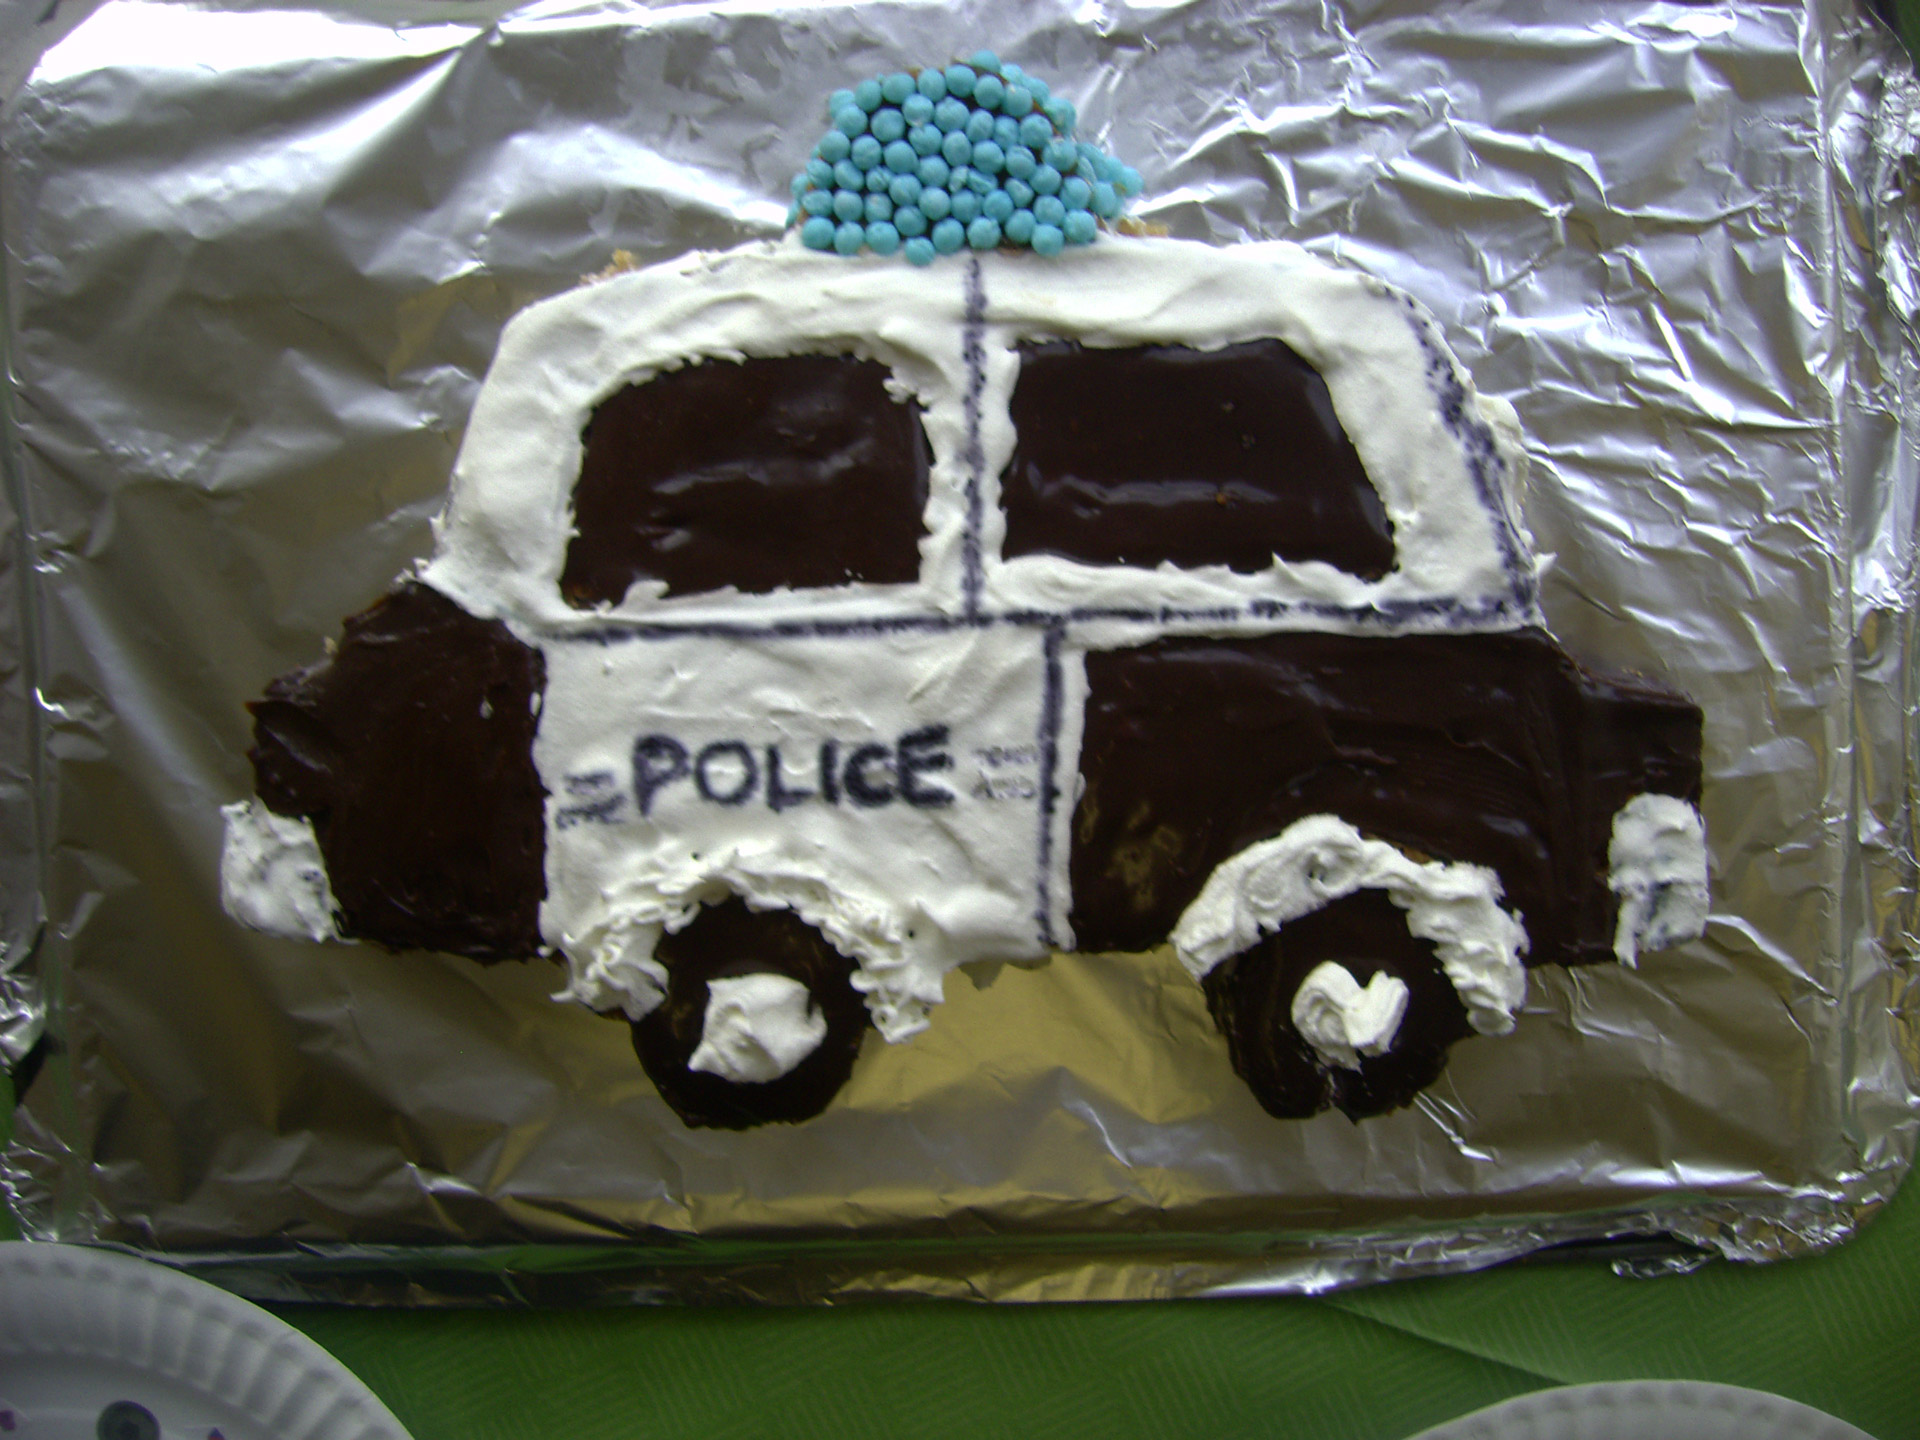 Decorate Police Car Police Car Cake Free Photo From Needpix Com